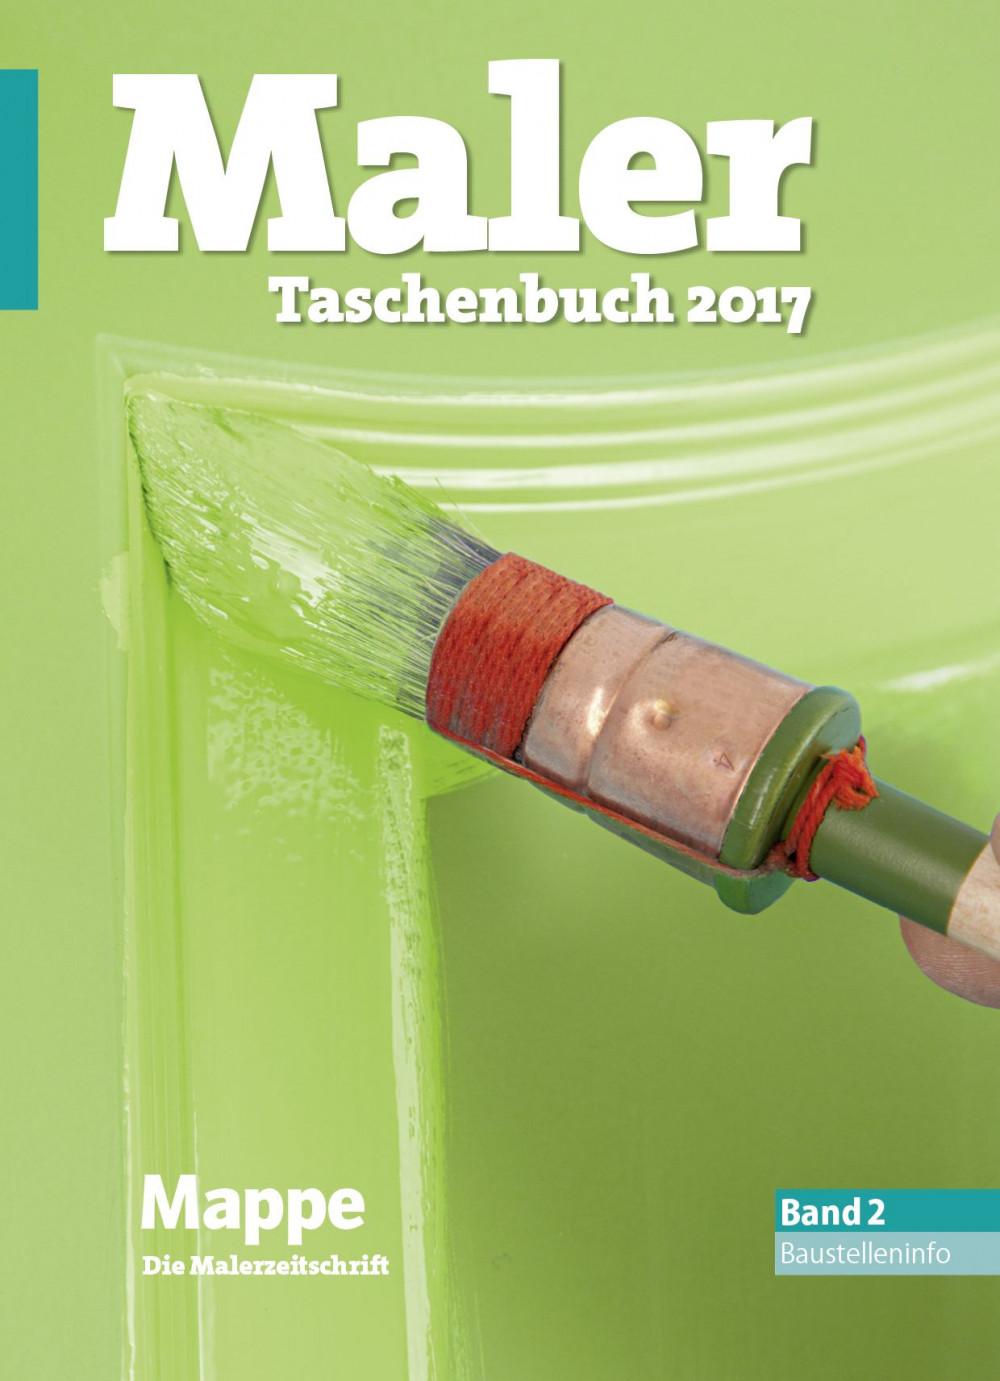 maler taschenbuch 2017 band 2 baustelleninfo callwey. Black Bedroom Furniture Sets. Home Design Ideas